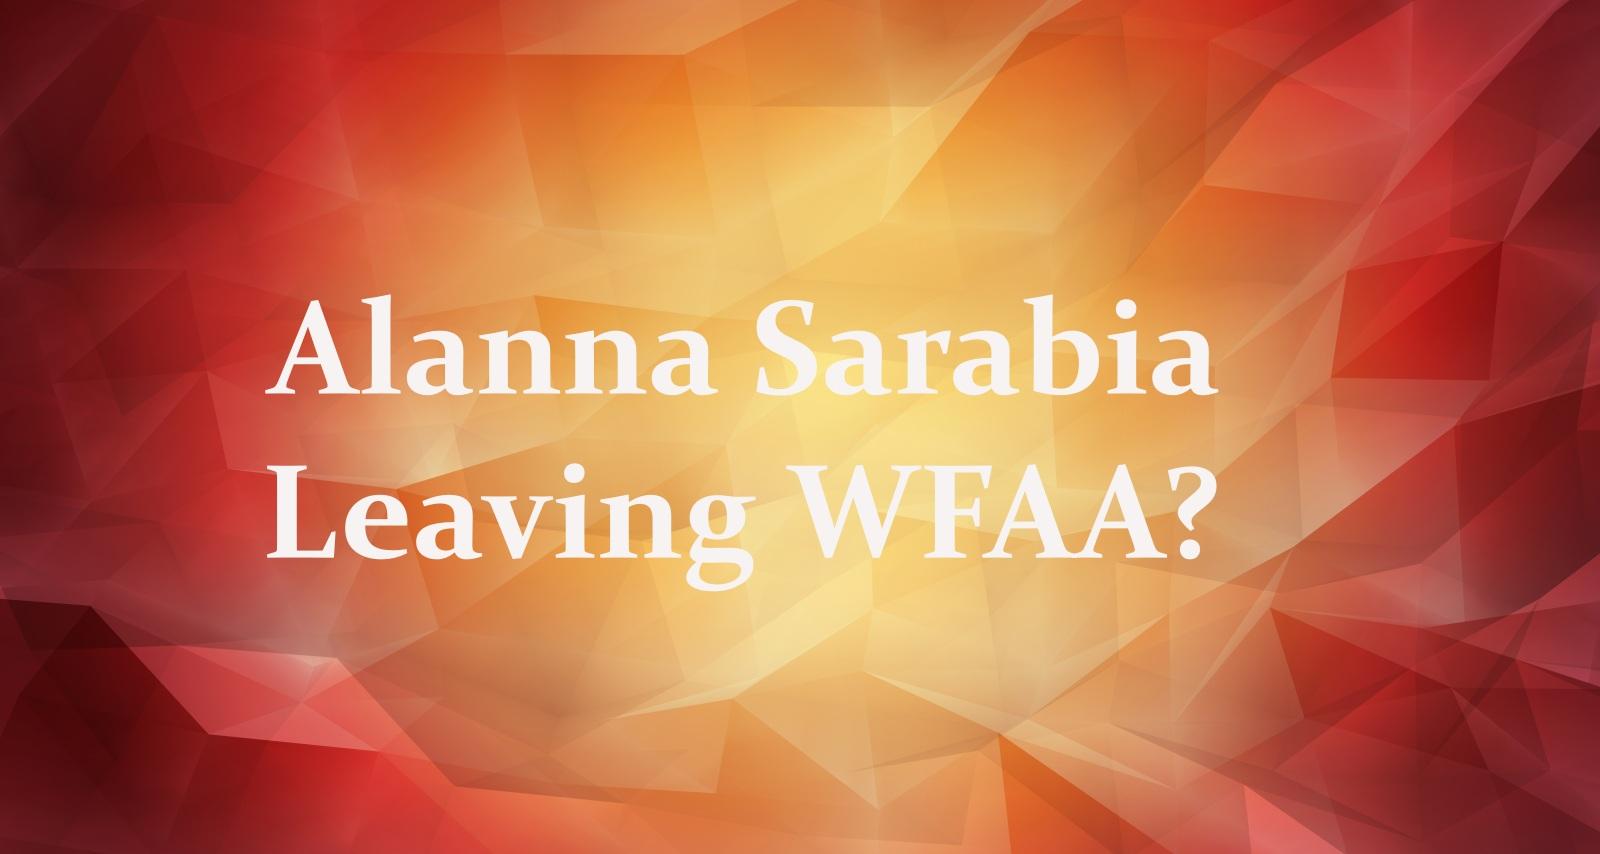 Alanna Sarabia Leaving WFAA